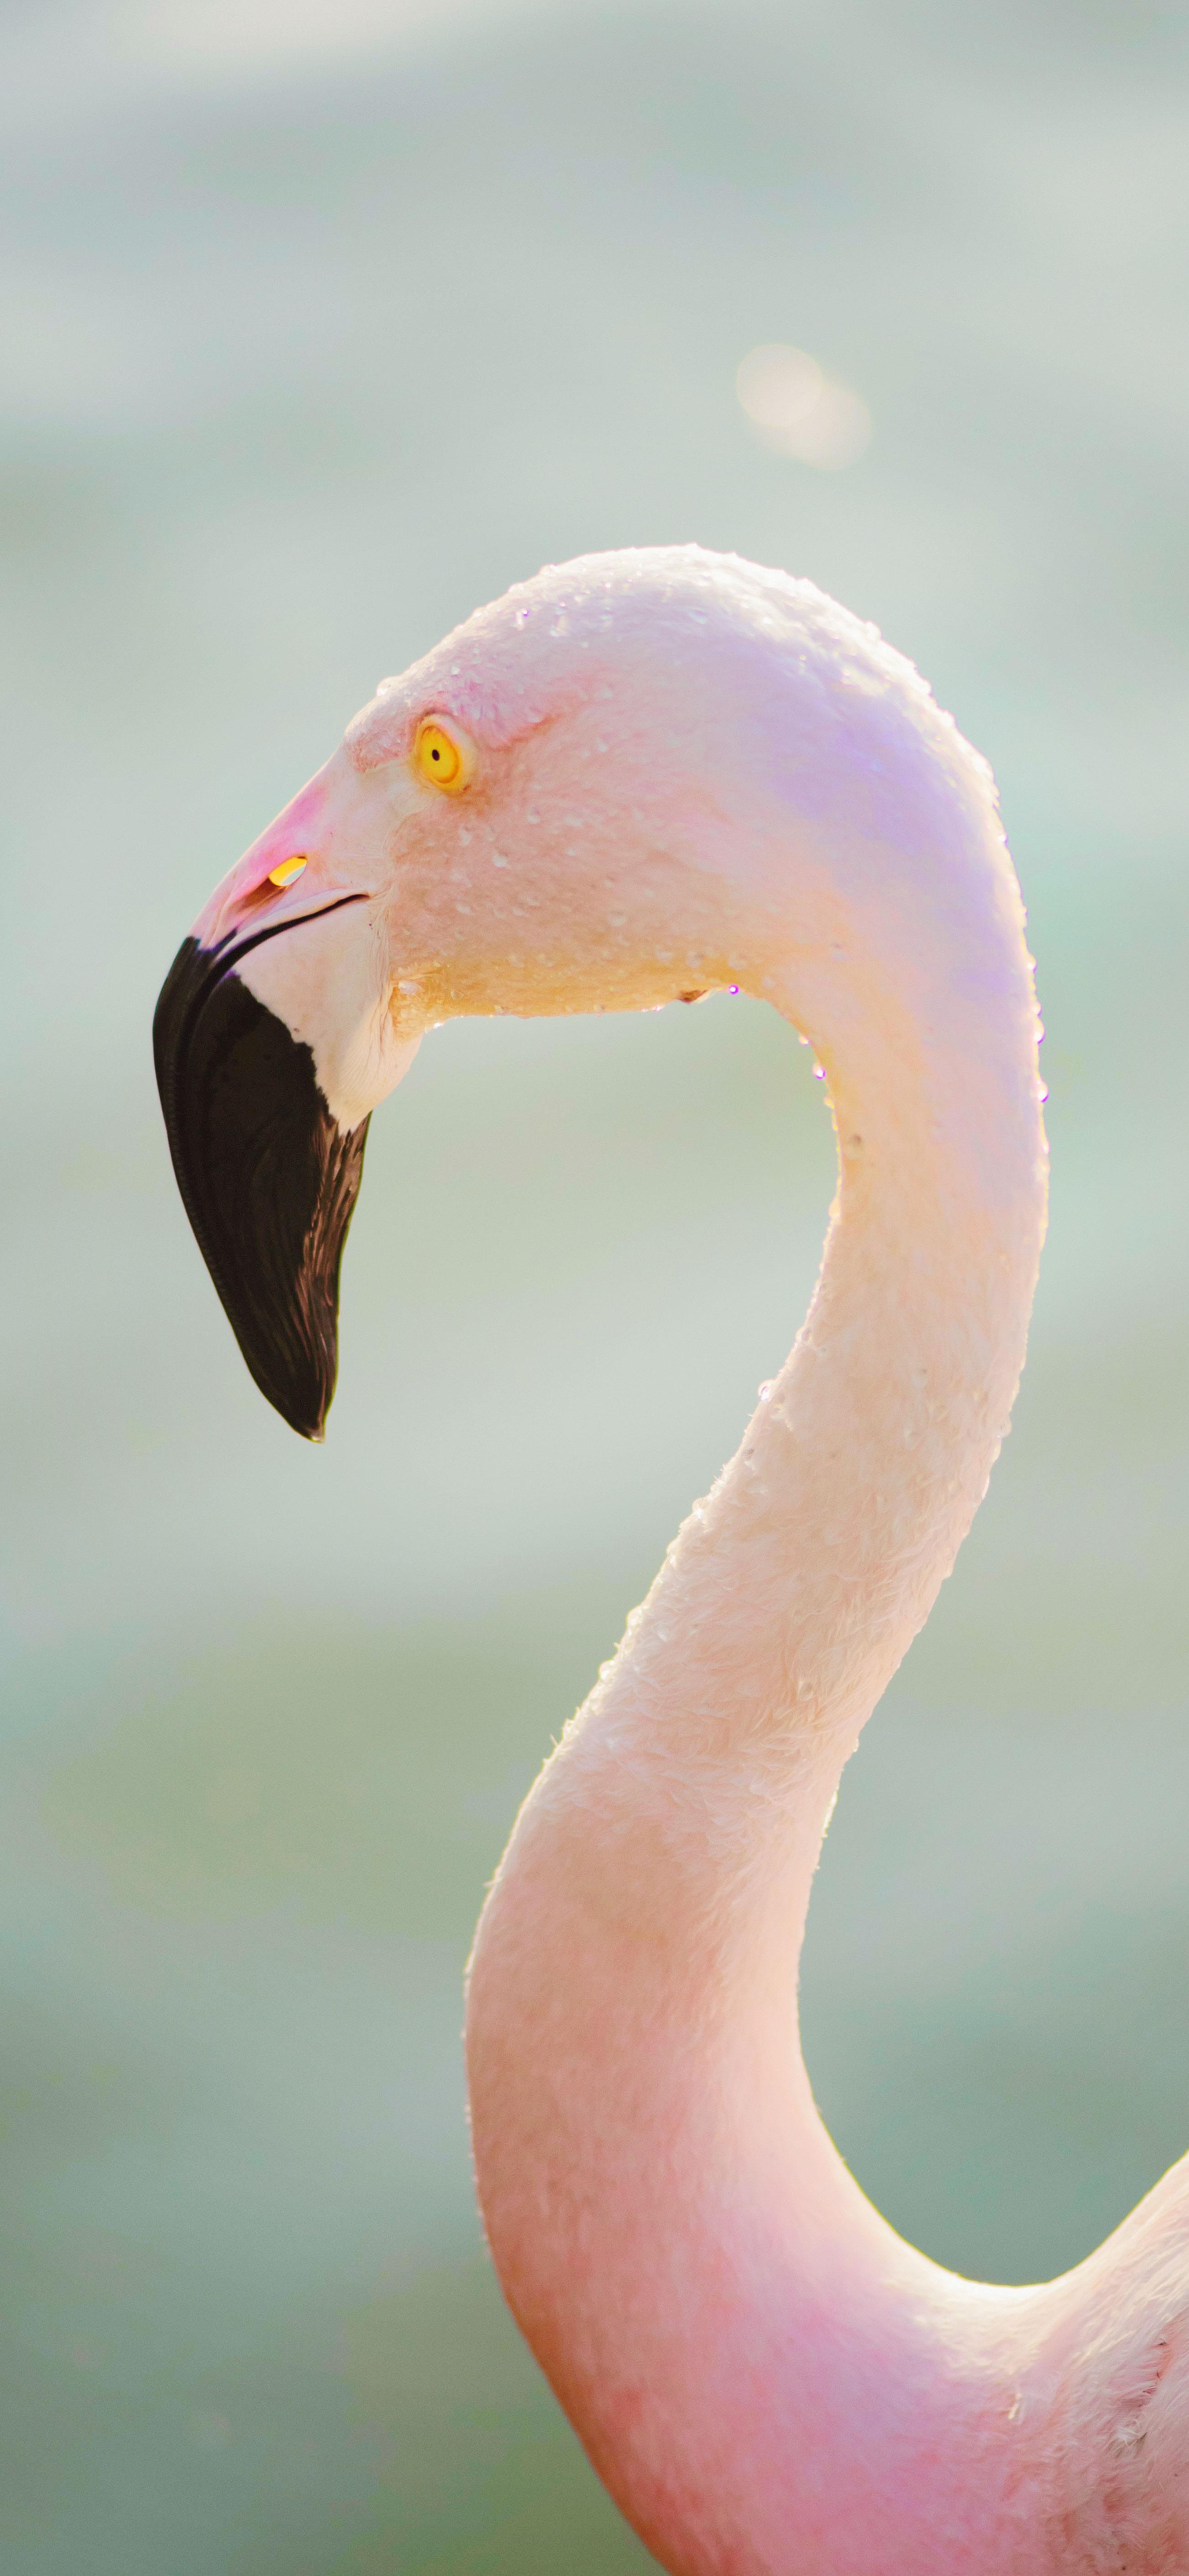 aesthetic-pink-flamingo-in-water-during-daytime-wallpaper